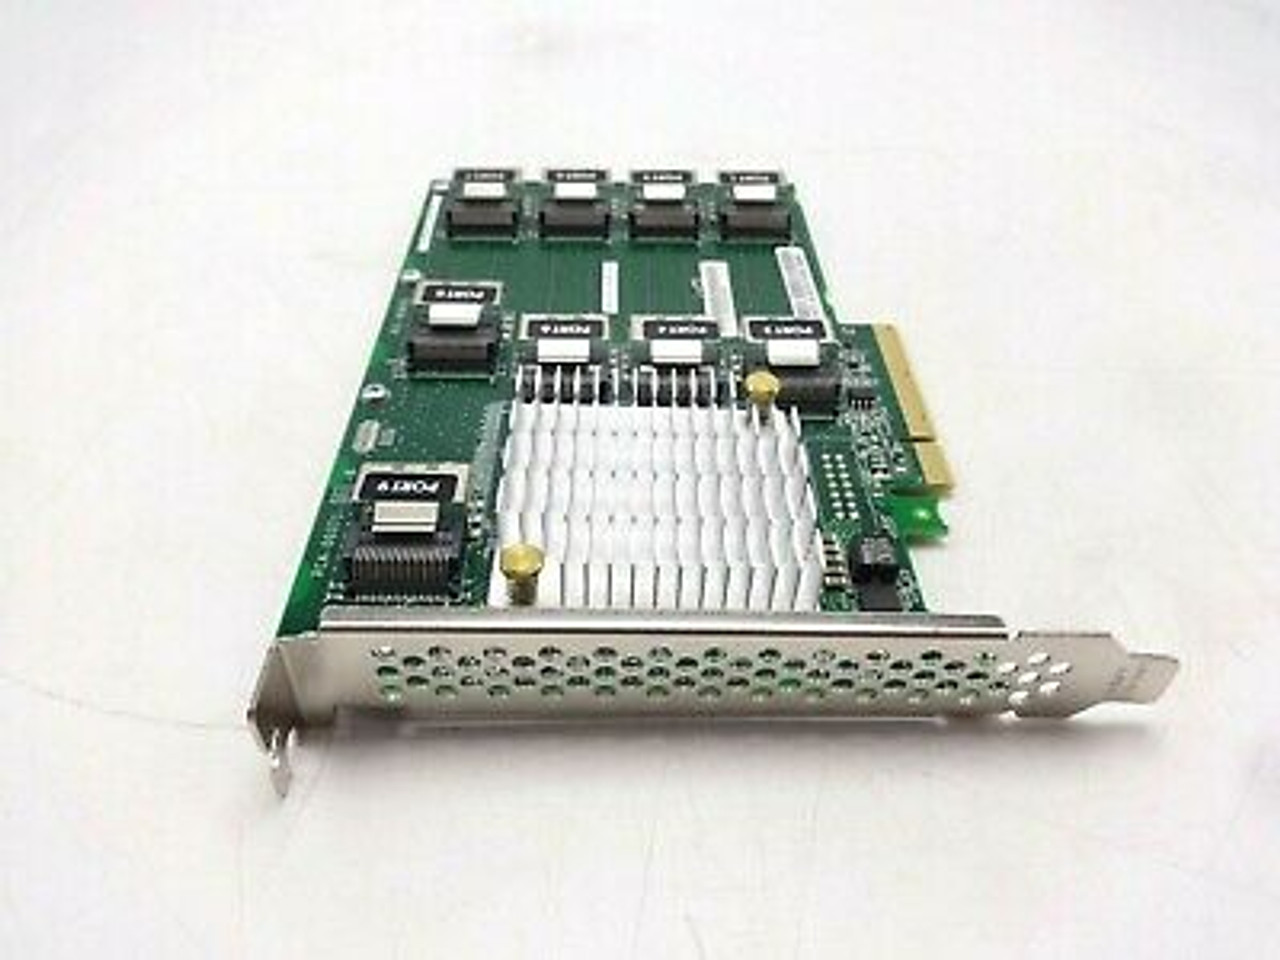 HP 761879-001 HPe DL380 G9 12G SAS Expander Card